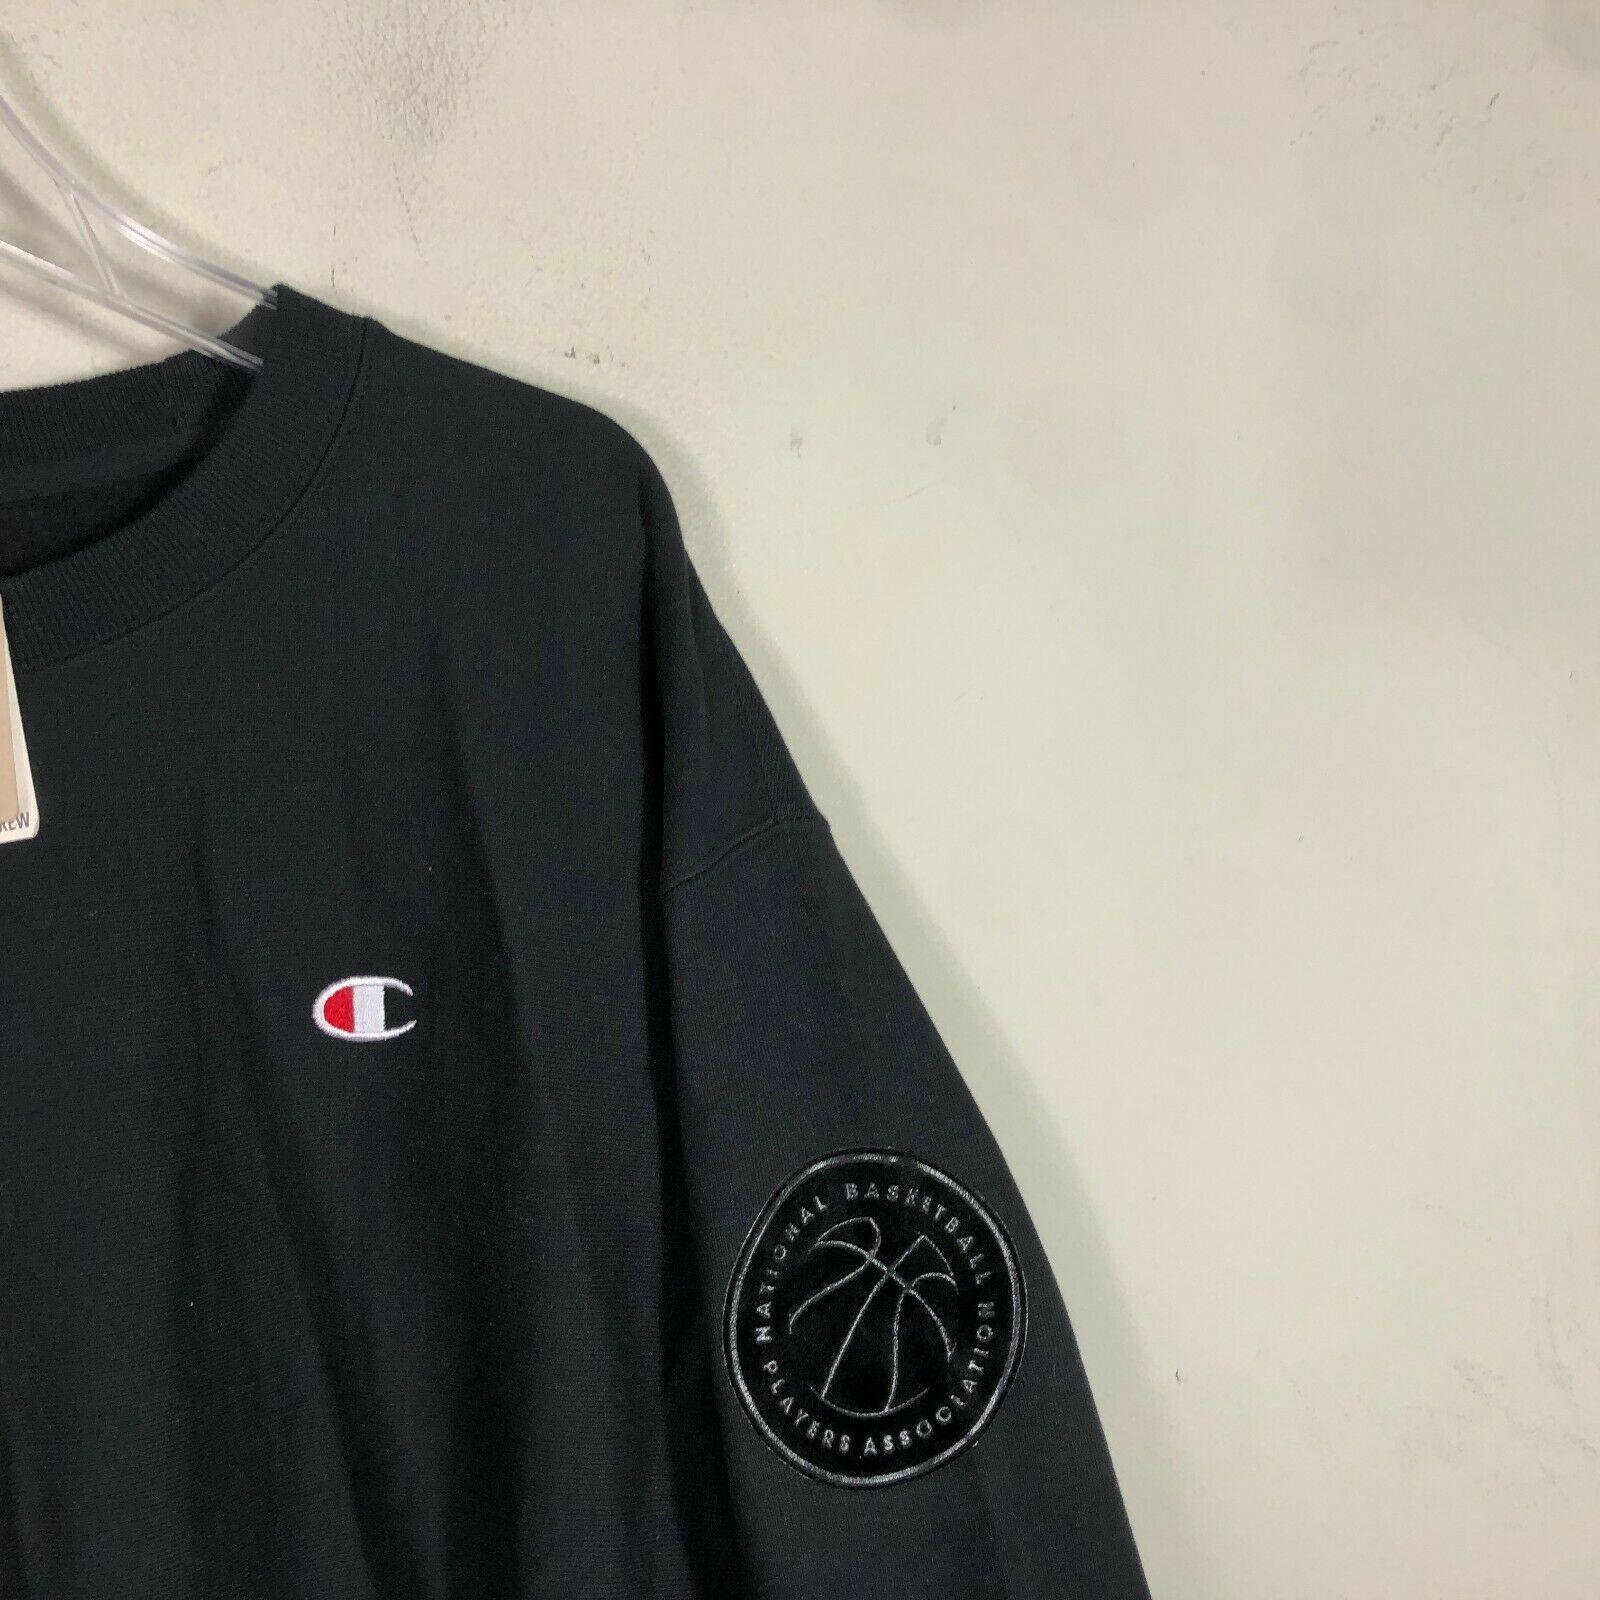 Vintage Champion Crew Neck Reverse Weave Sweatshirt XL NBA NBPA Sweatshirt image 5